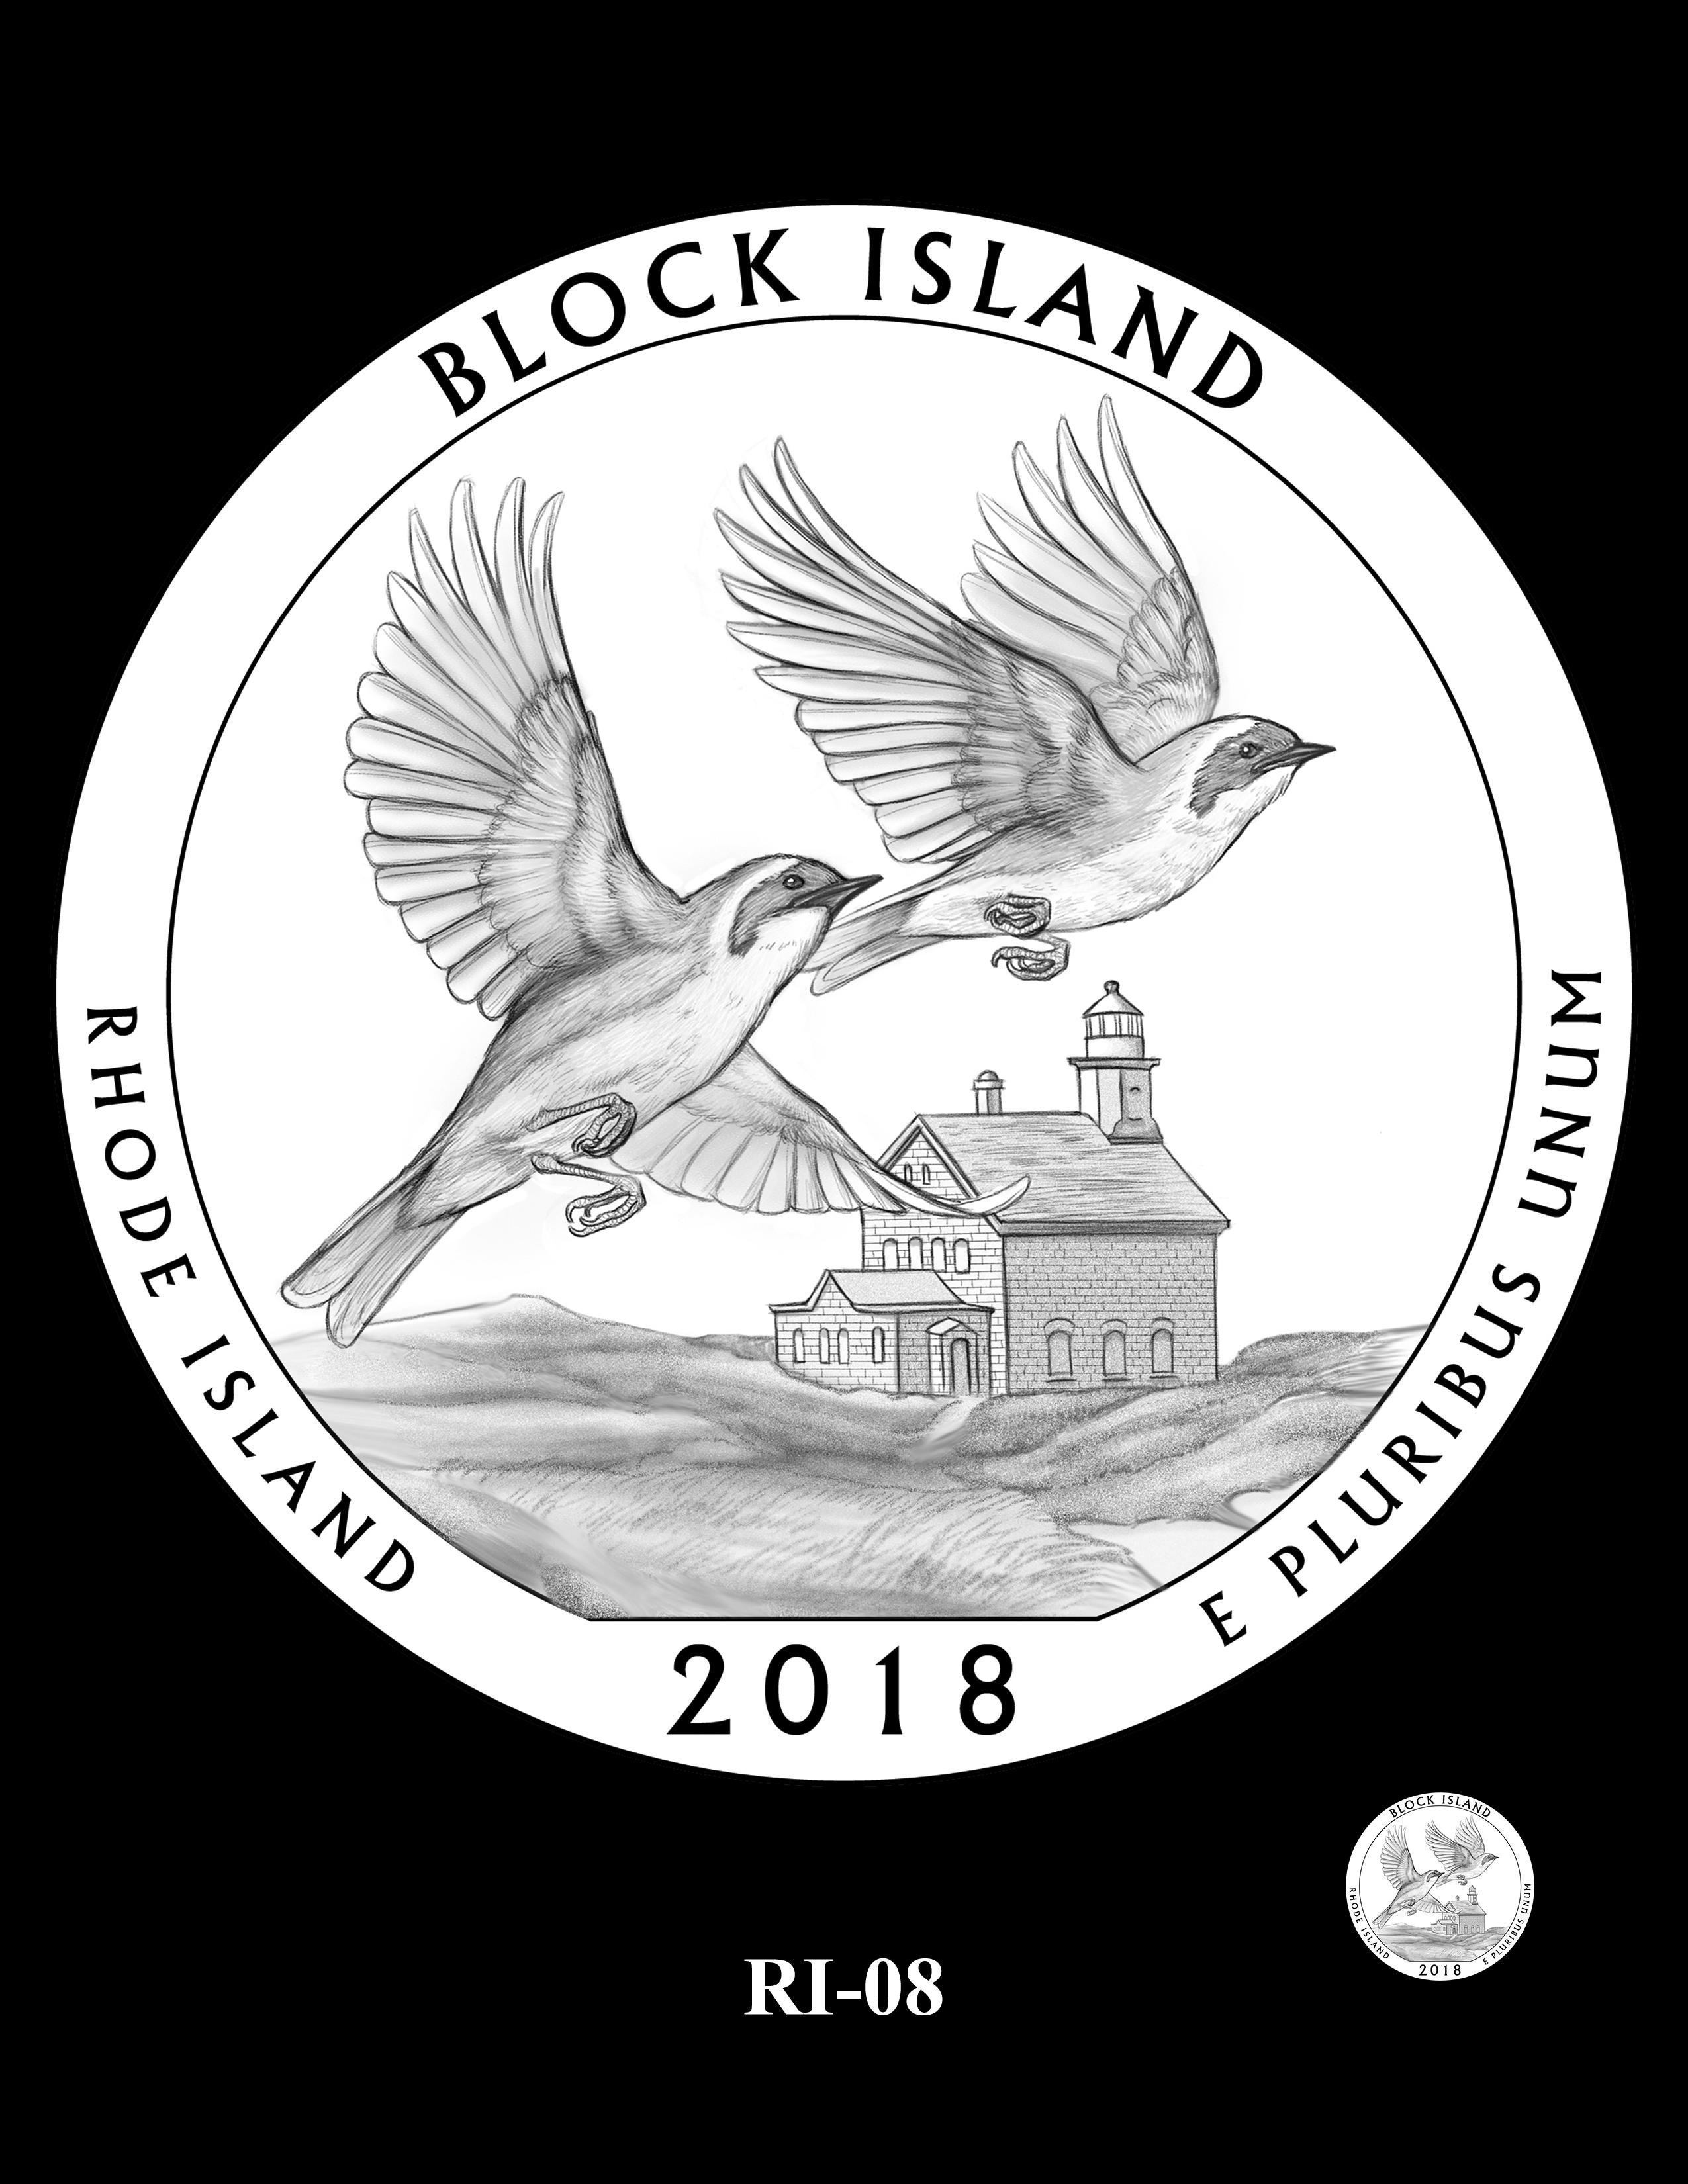 RI-08 -- 2018 America the Beautiful® Quarters Program